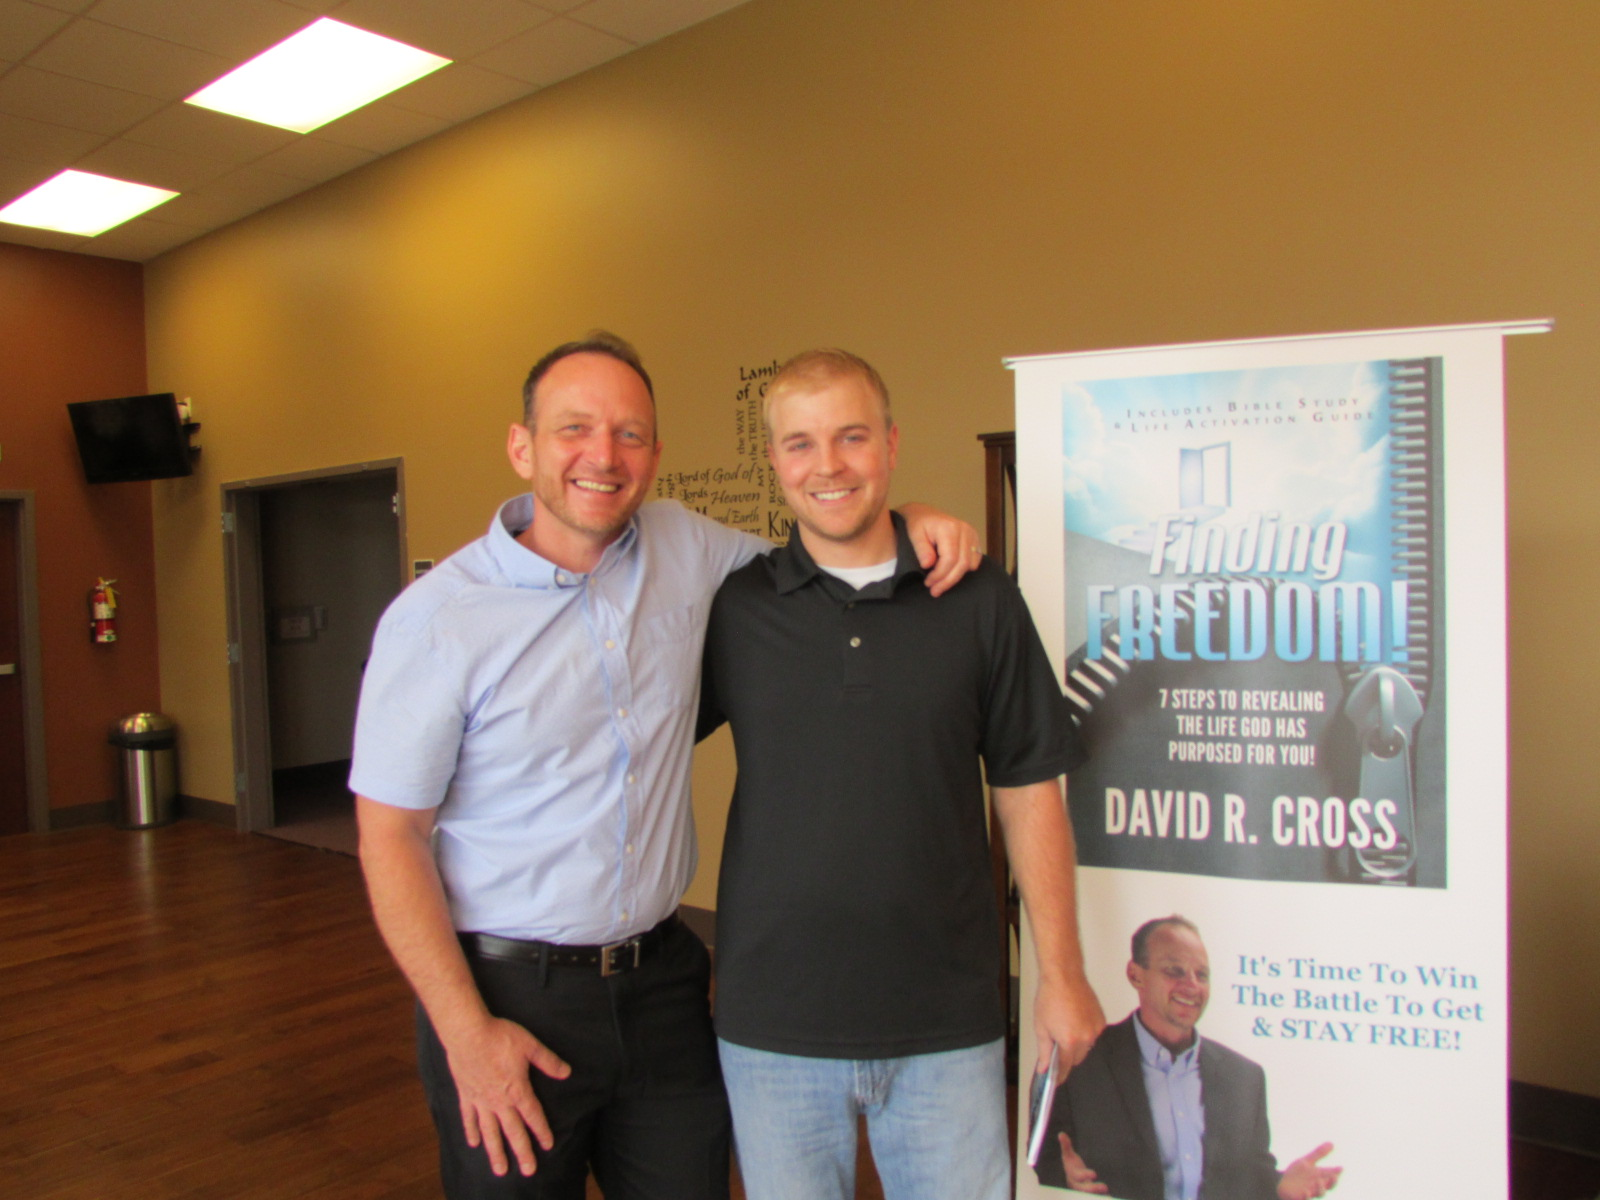 David R Cross